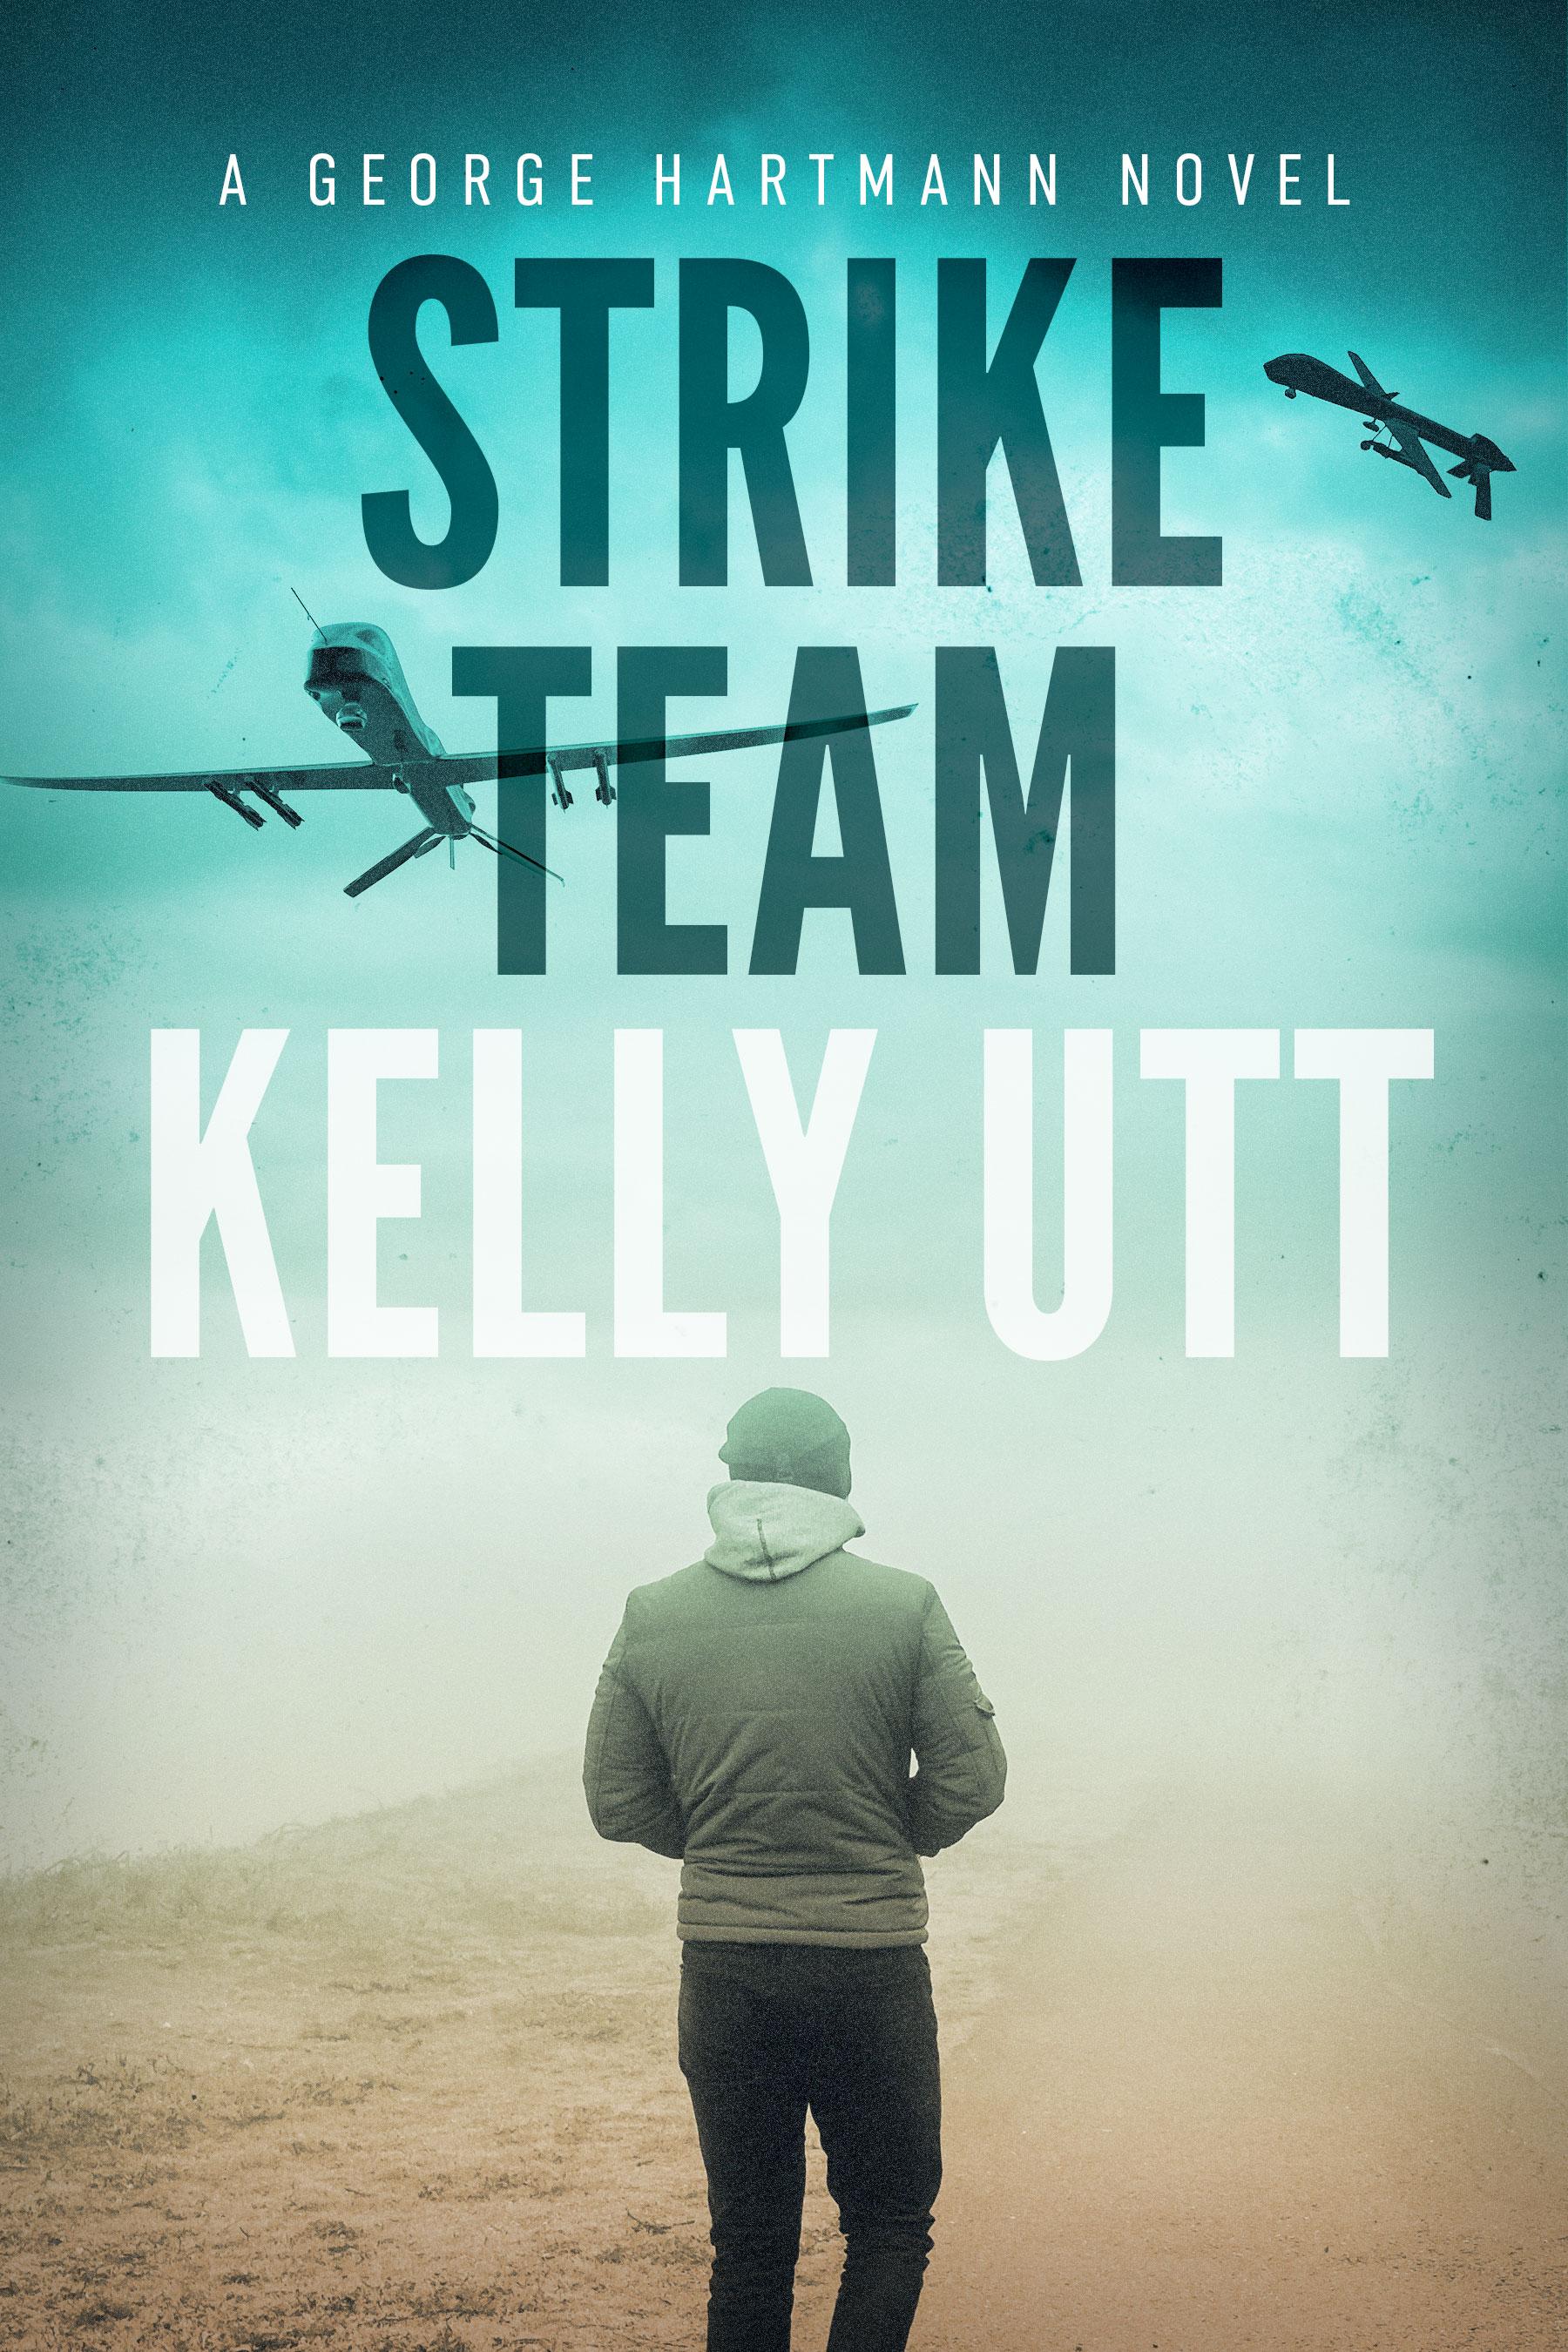 Strike Team - George Hartmann Book 6